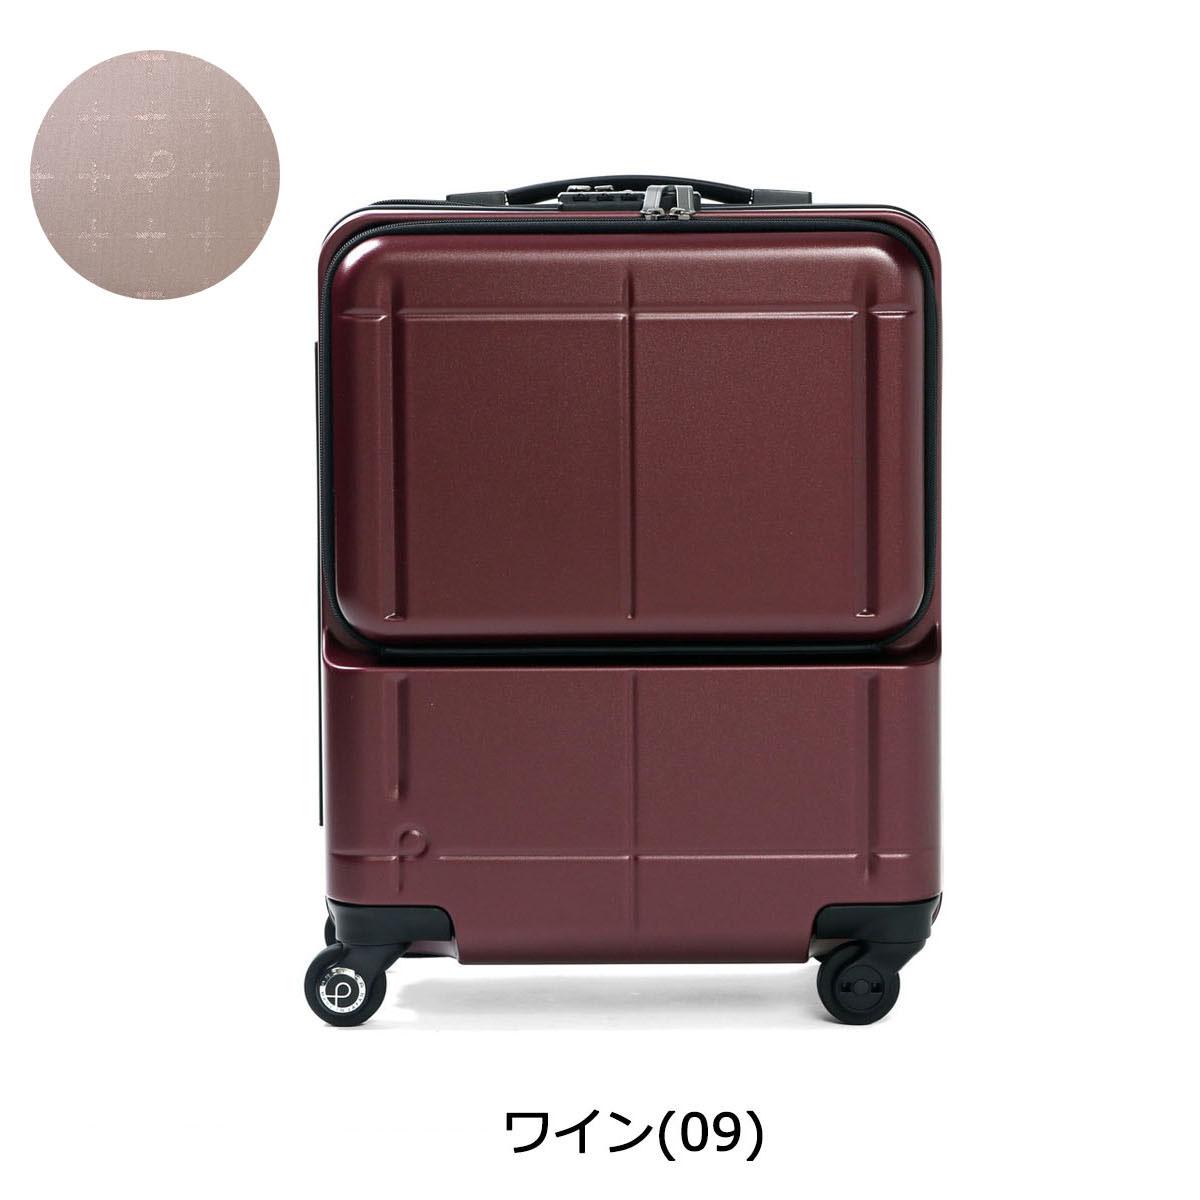 PROTeCA 蛋白带 40 L 最大通 MAXPASS H2 飞机随身携带最大容量 TSA 锁定 2-3 天关于口袋携带箱小努力旅行 ACE 品牌新-ACE 02651